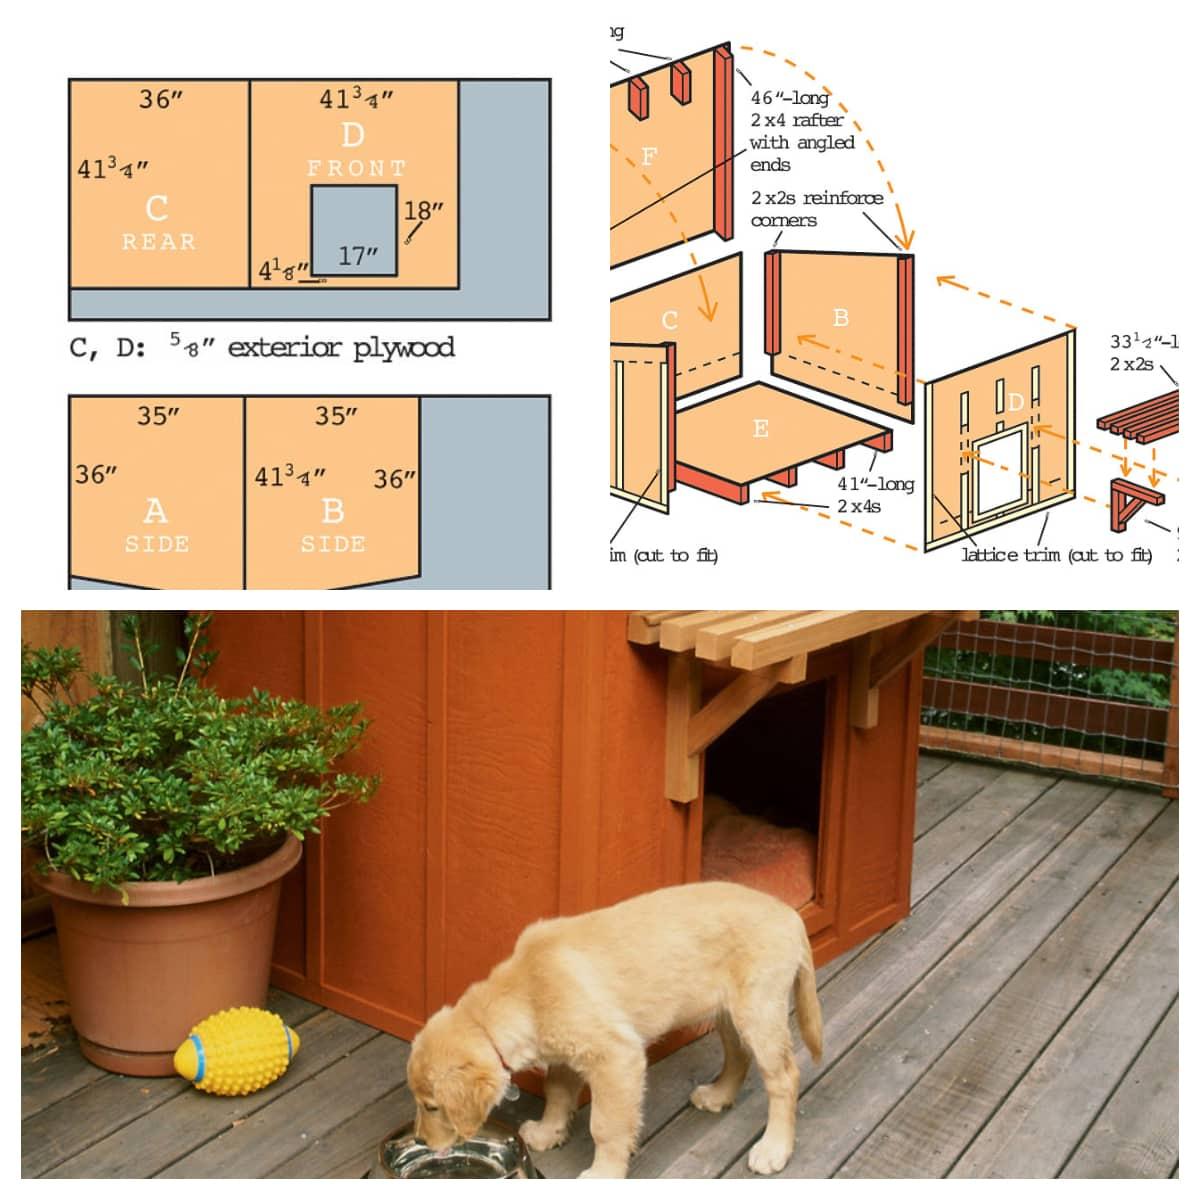 14 Diy Dog Houses How To Build A Dog House Plans Blueprints